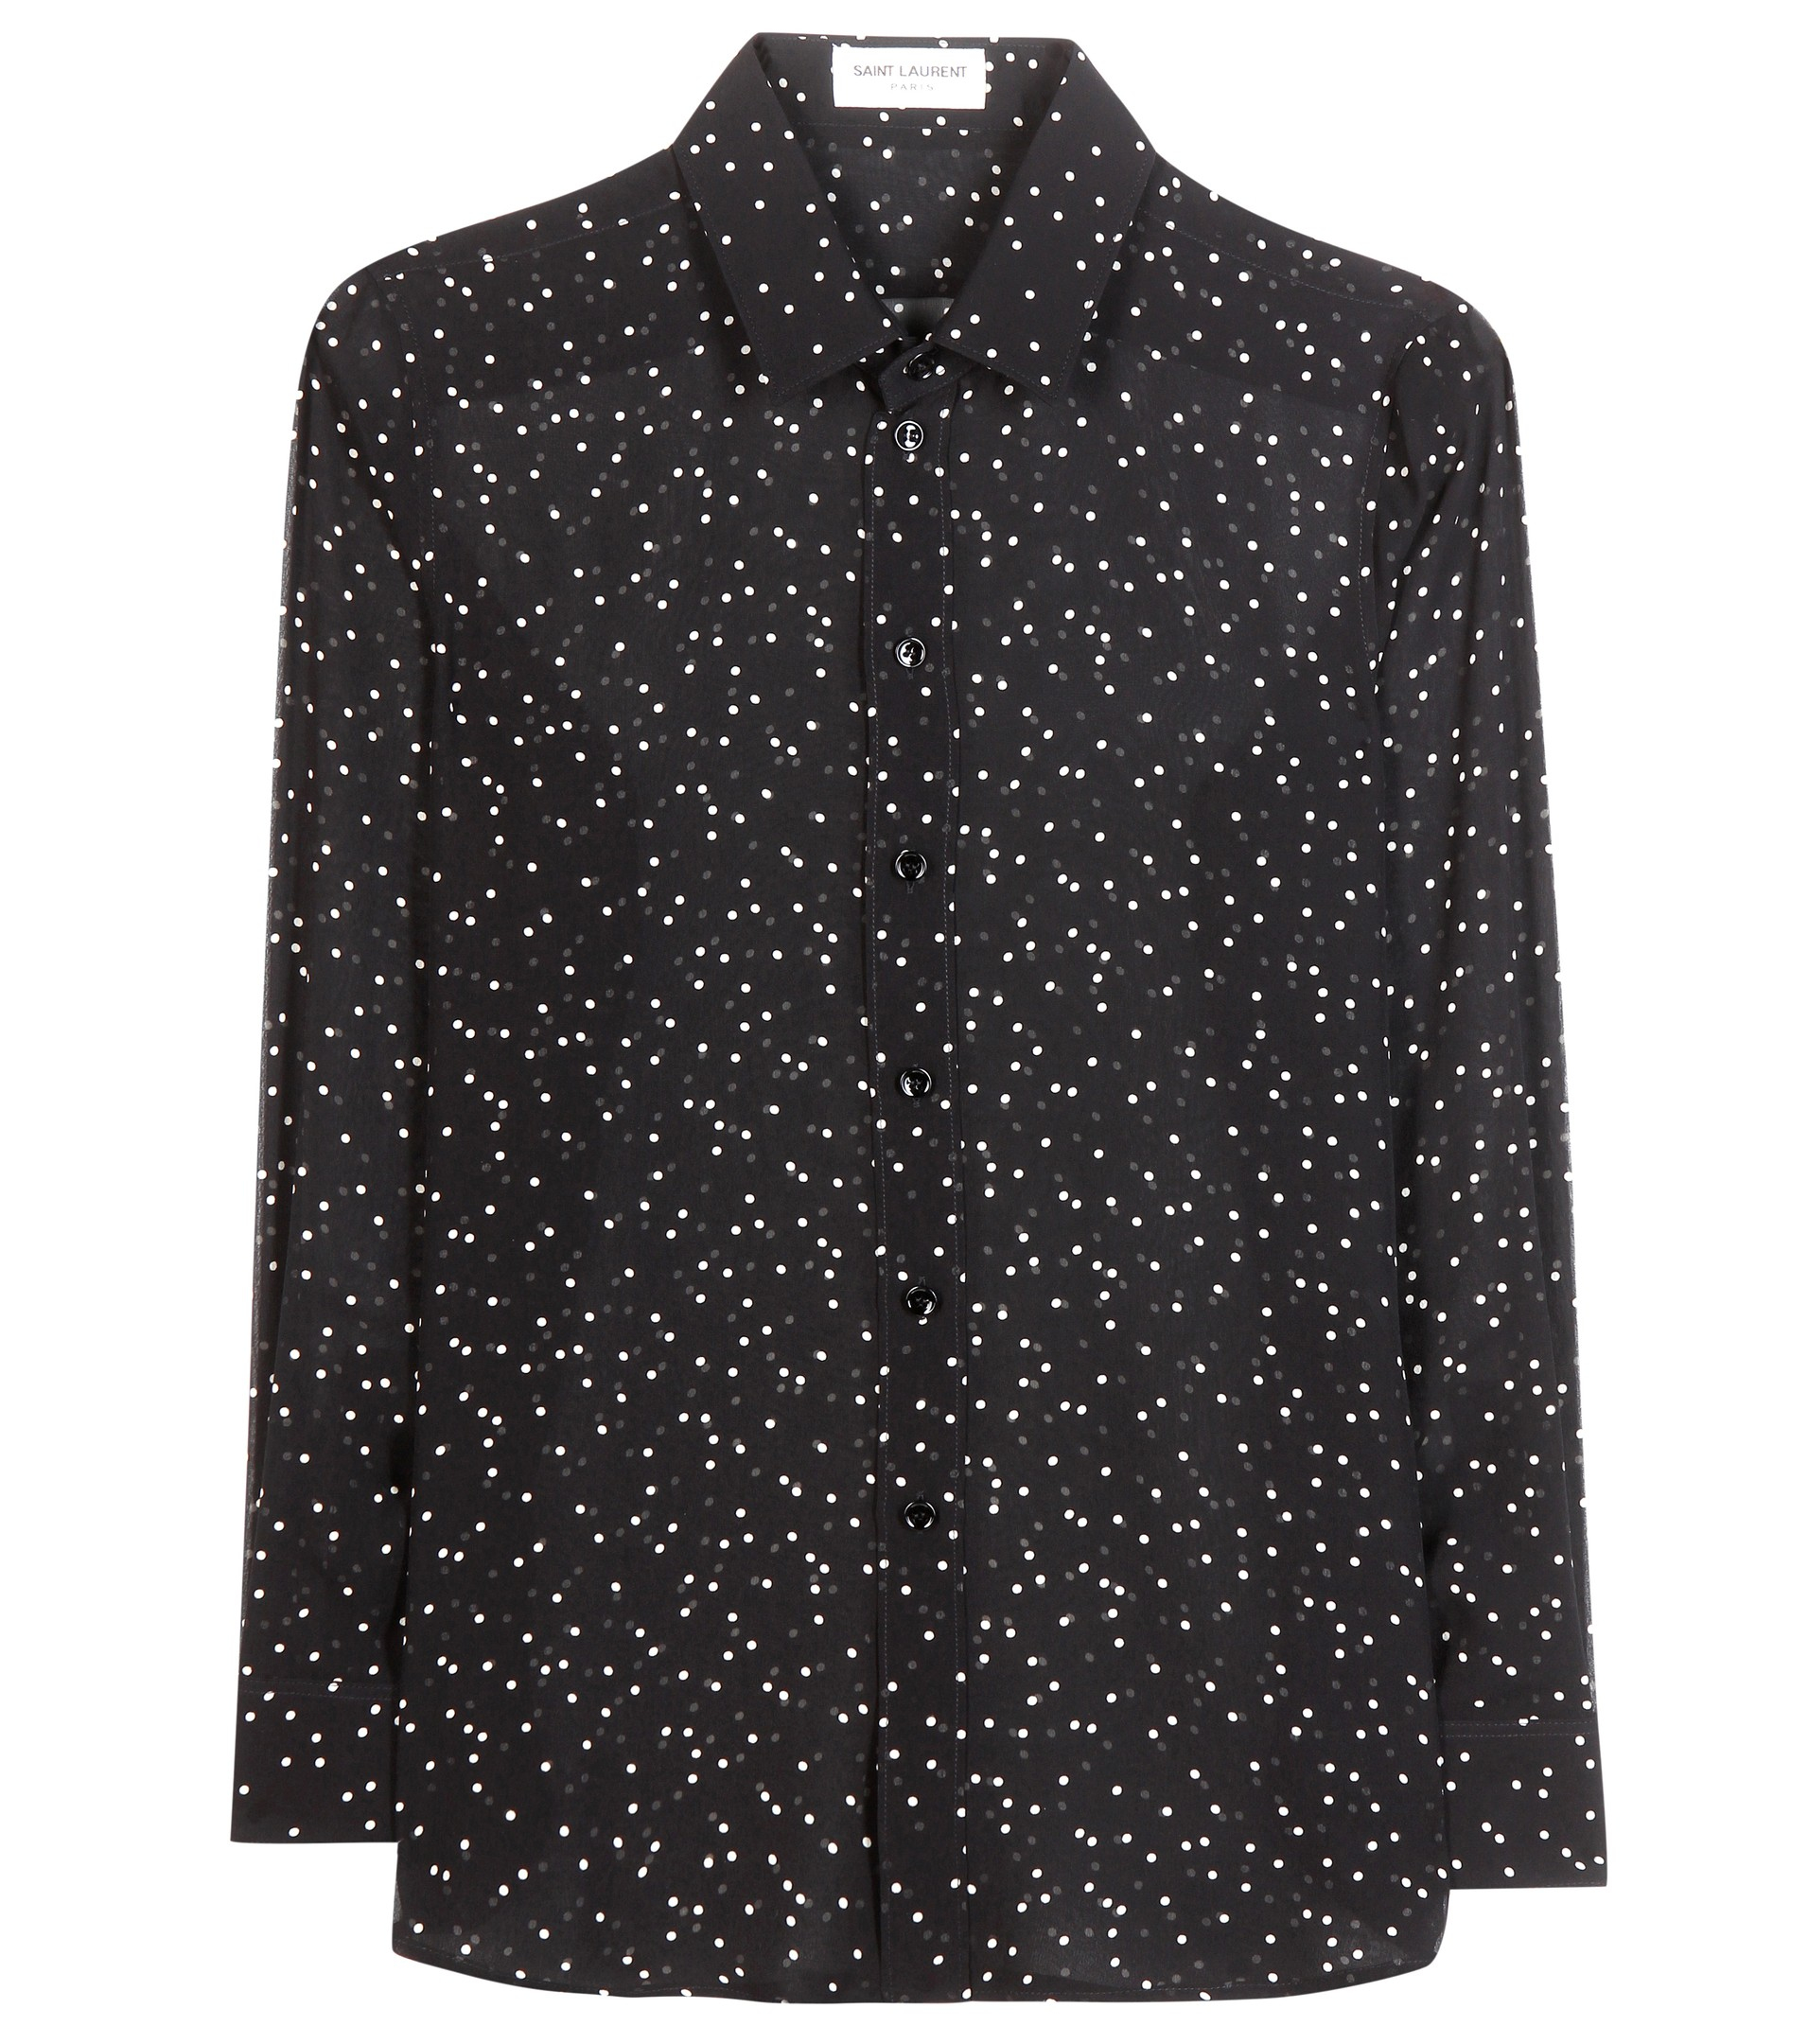 8ba0750092698c Lyst - Saint Laurent Polka-dot Silk Shirt in Black